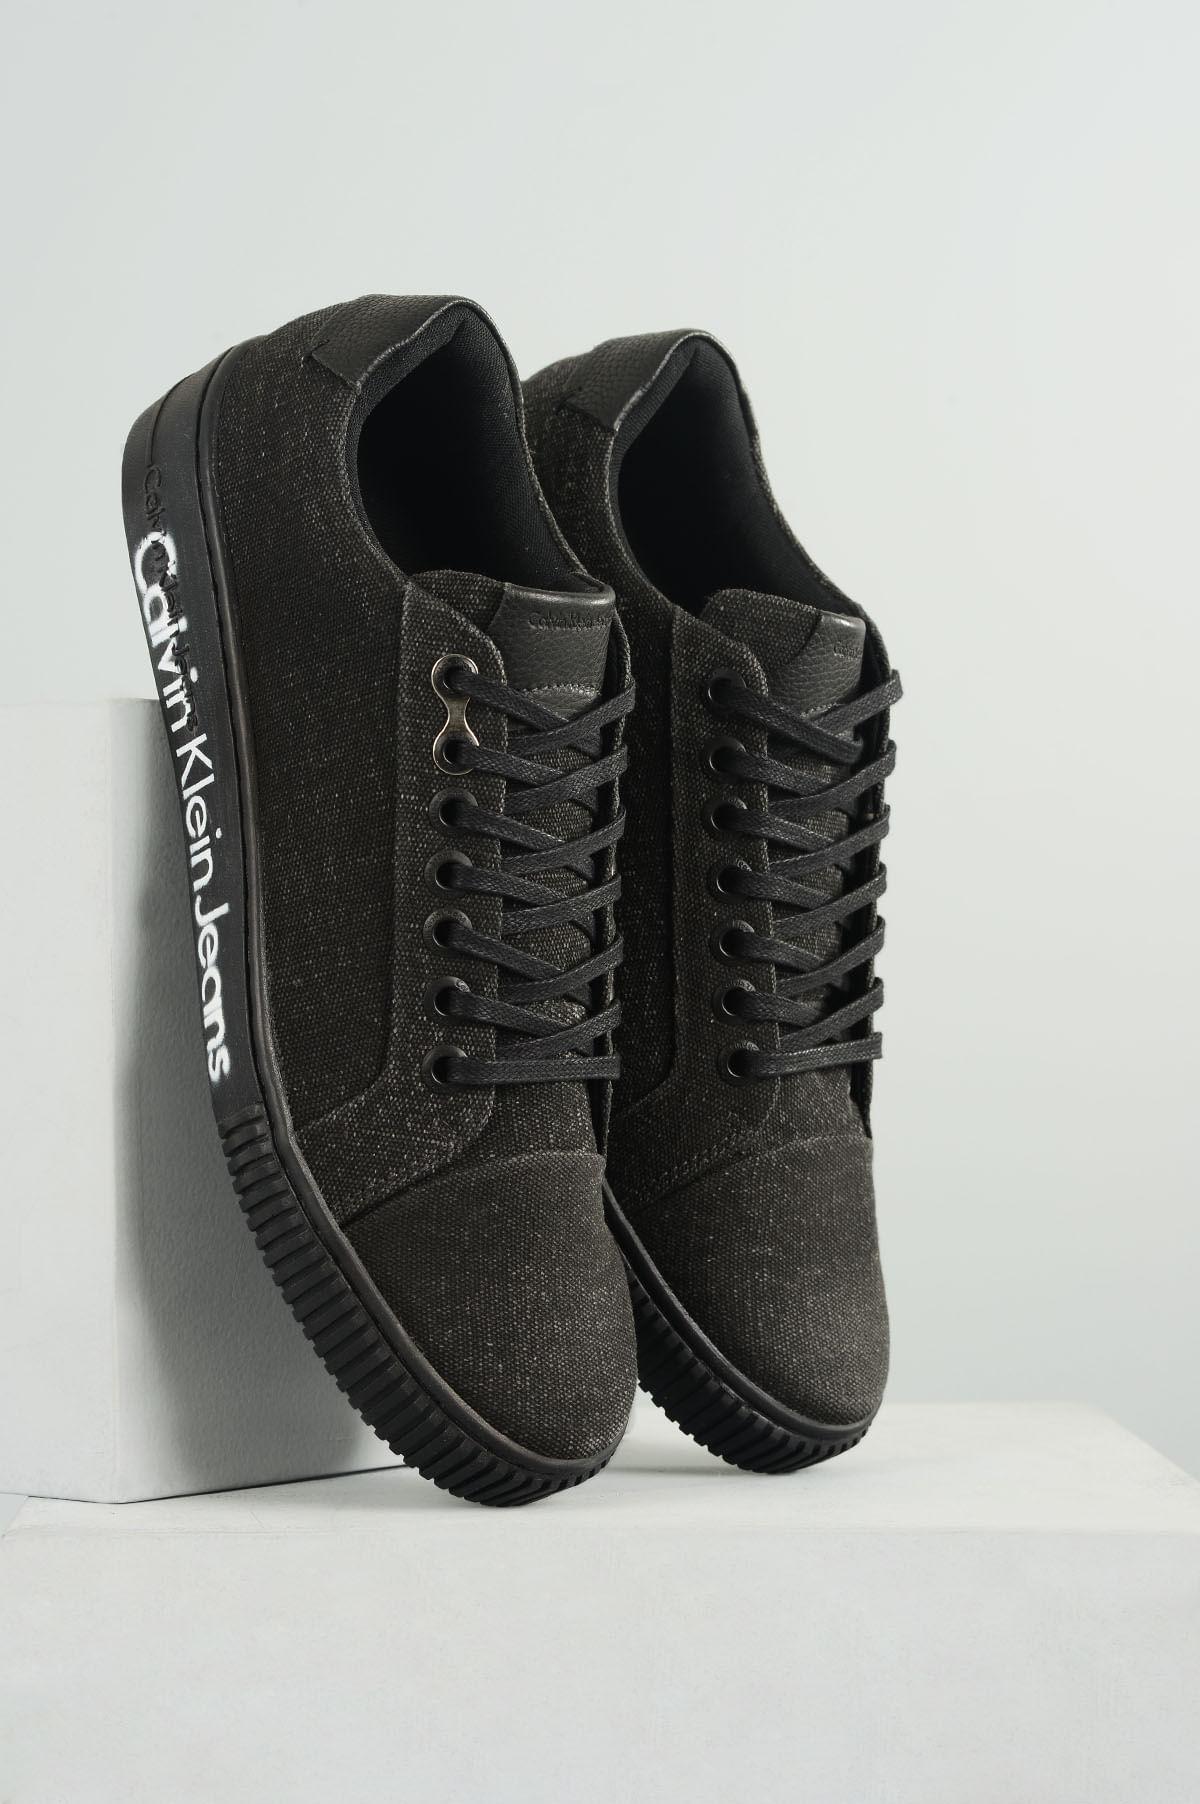 c8fe0eb72 Sapatênis Masculino Calvin Klein Leandro TEC - PRETO - Mundial Calçados